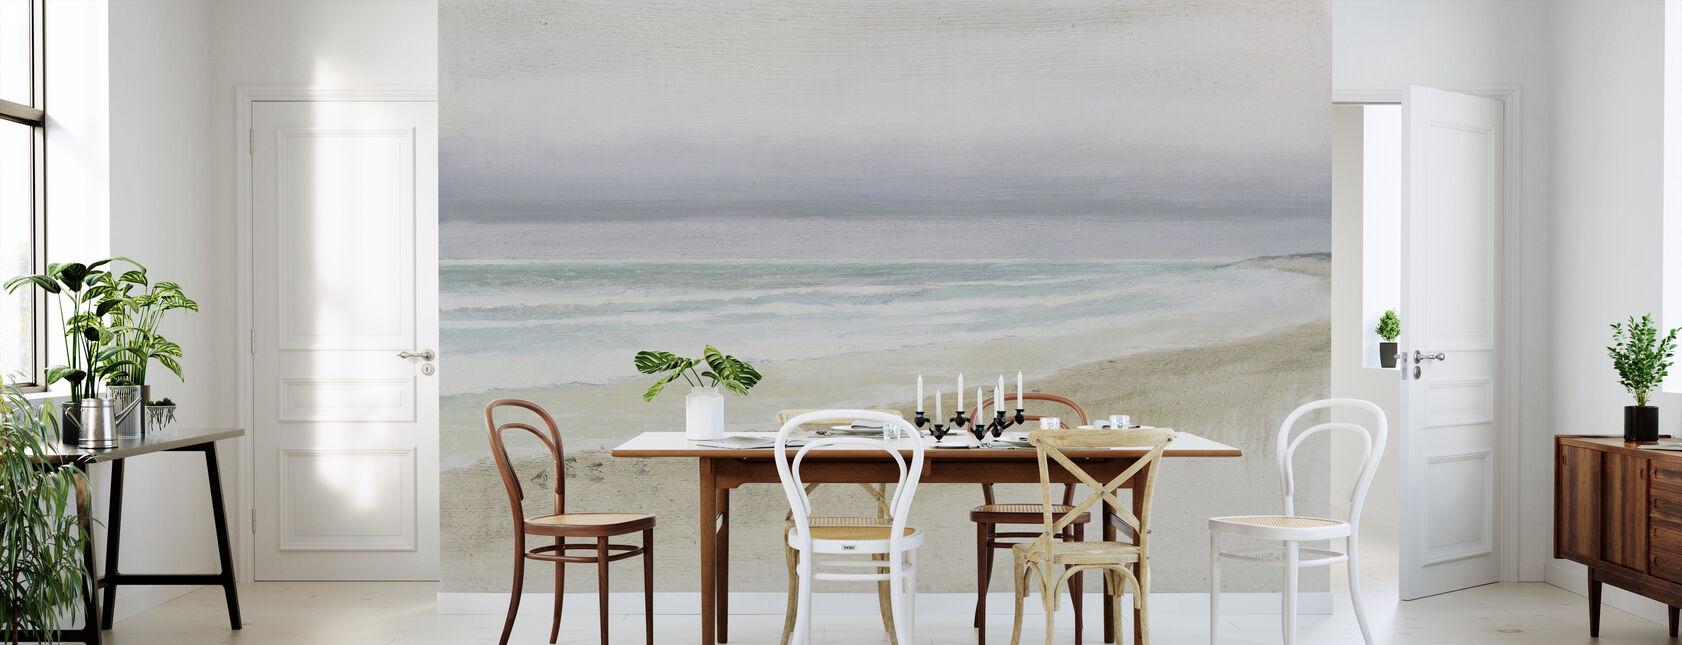 Serene Seaside - Wallpaper - Kitchen